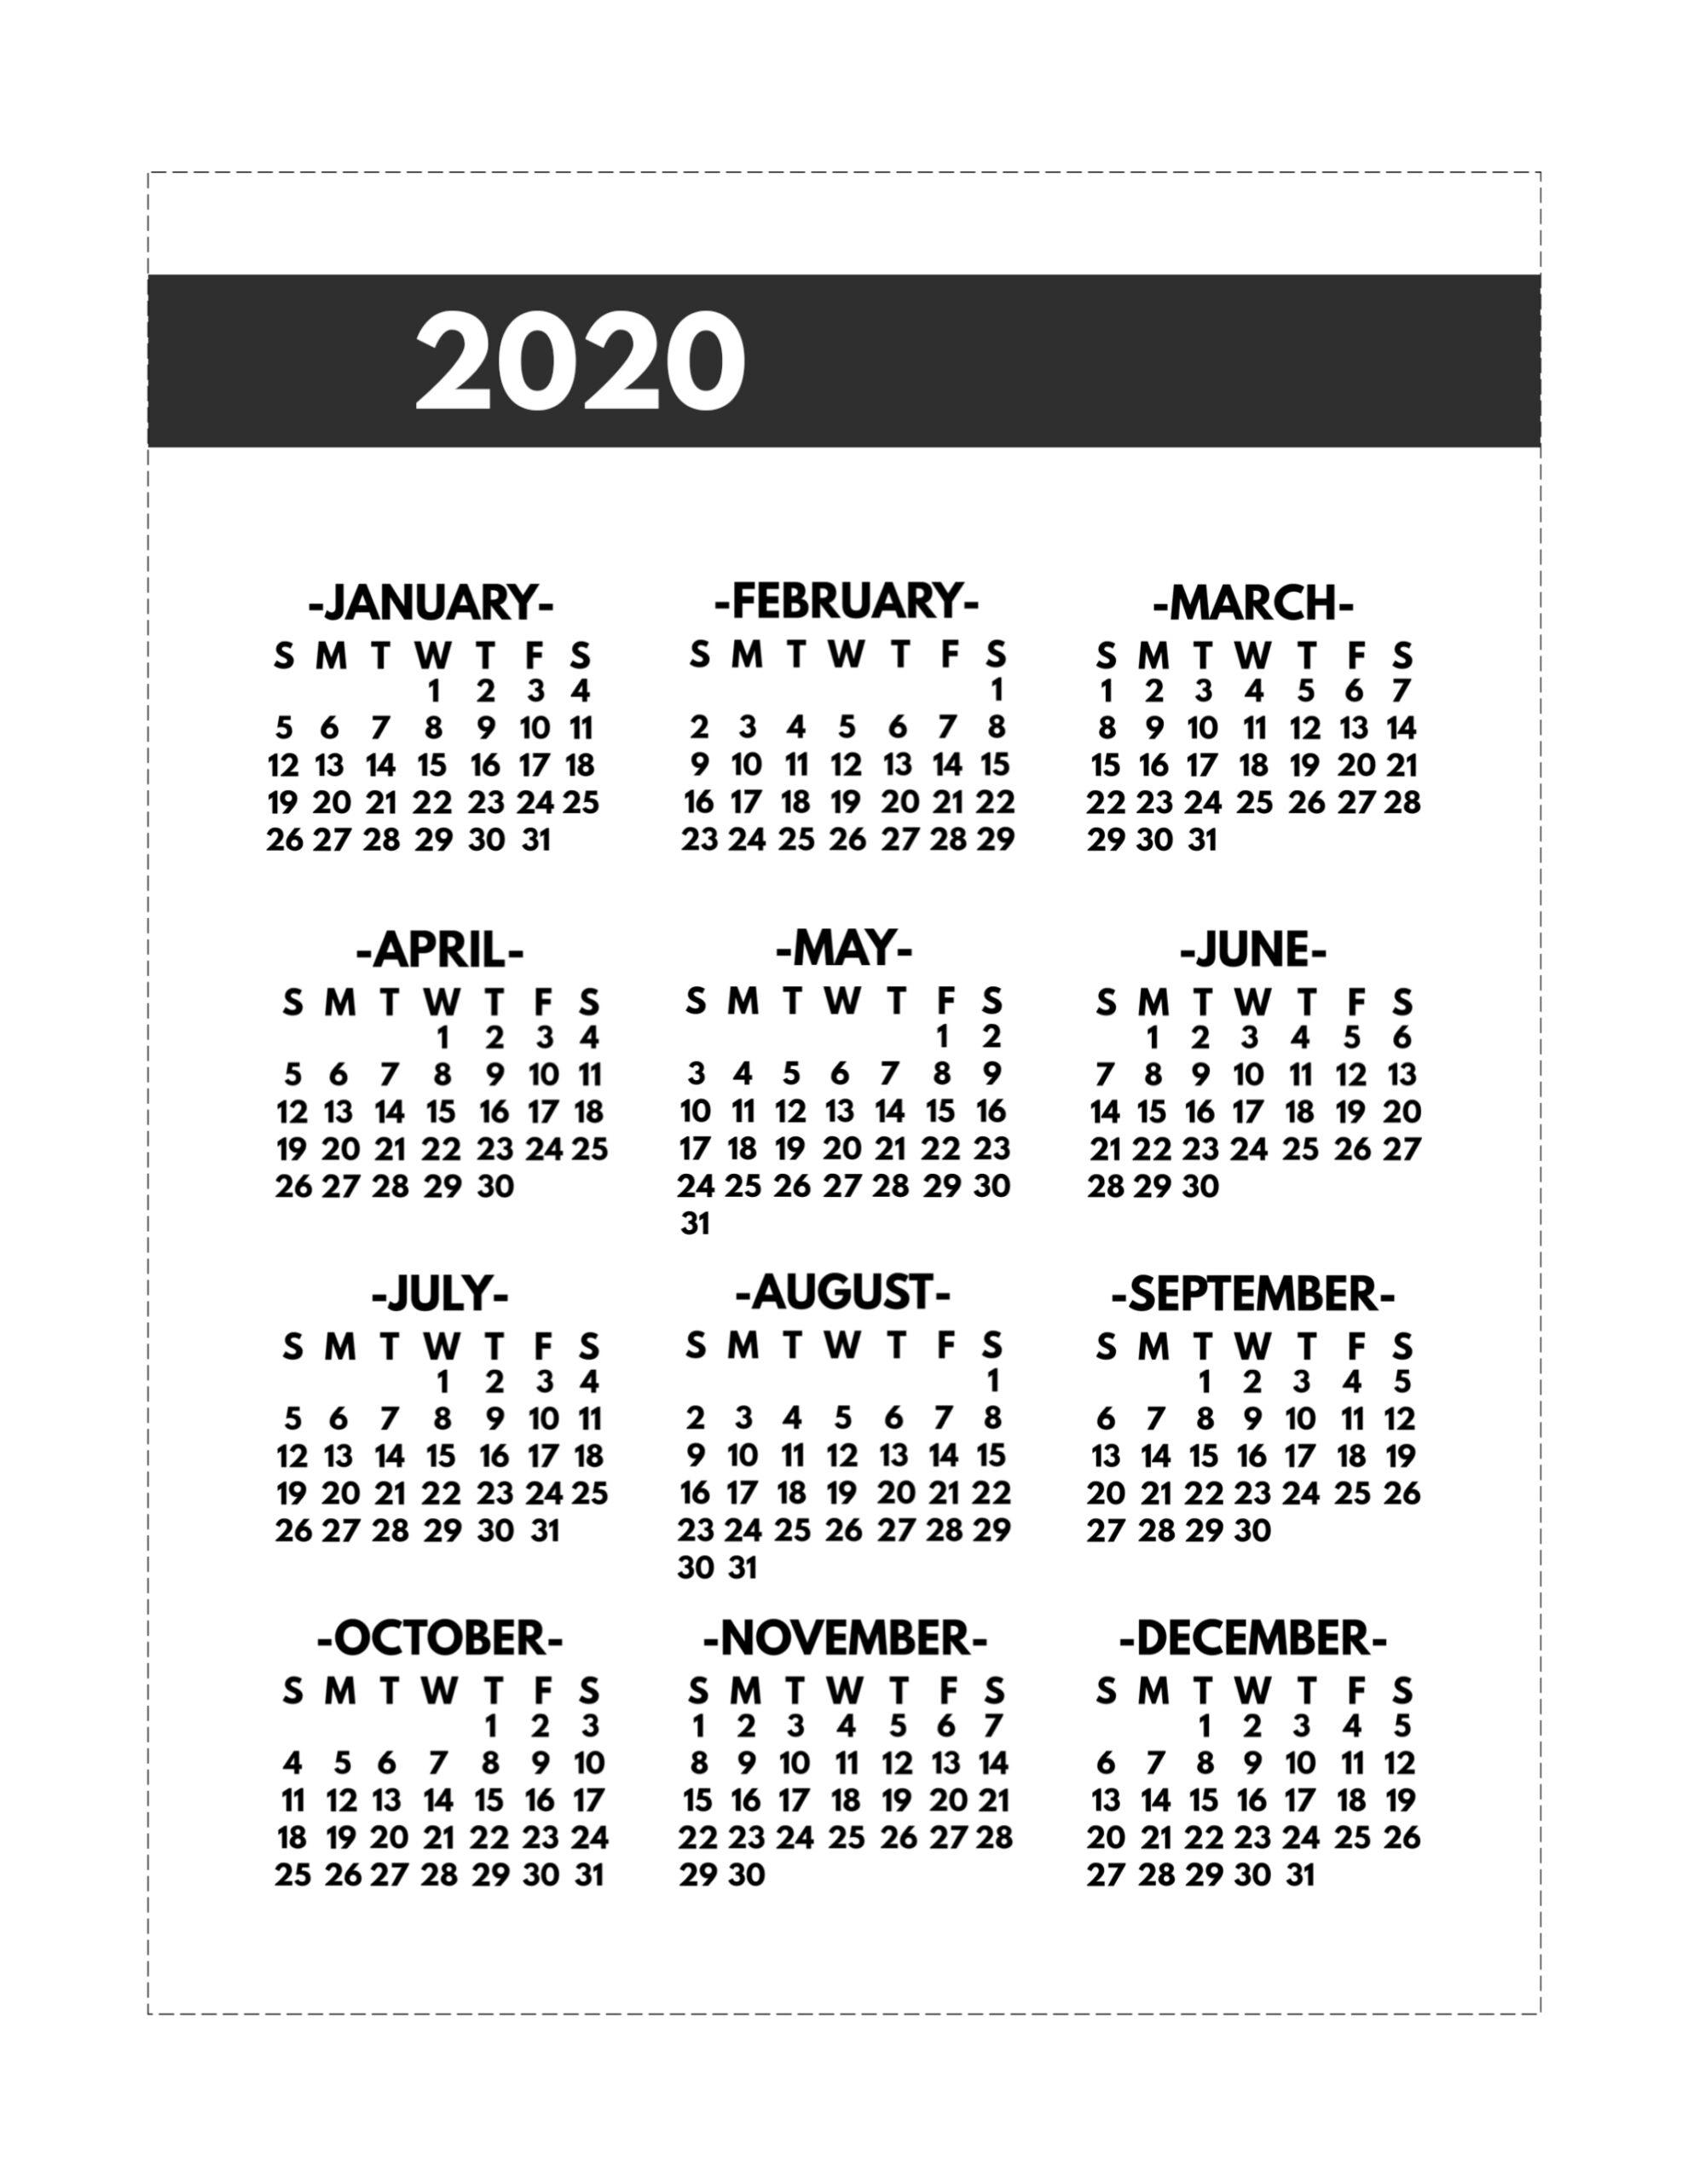 2020 Printable One Page Year At A Glance Calendar - Paper with regard to Free Printable Year At A Glance Calendar